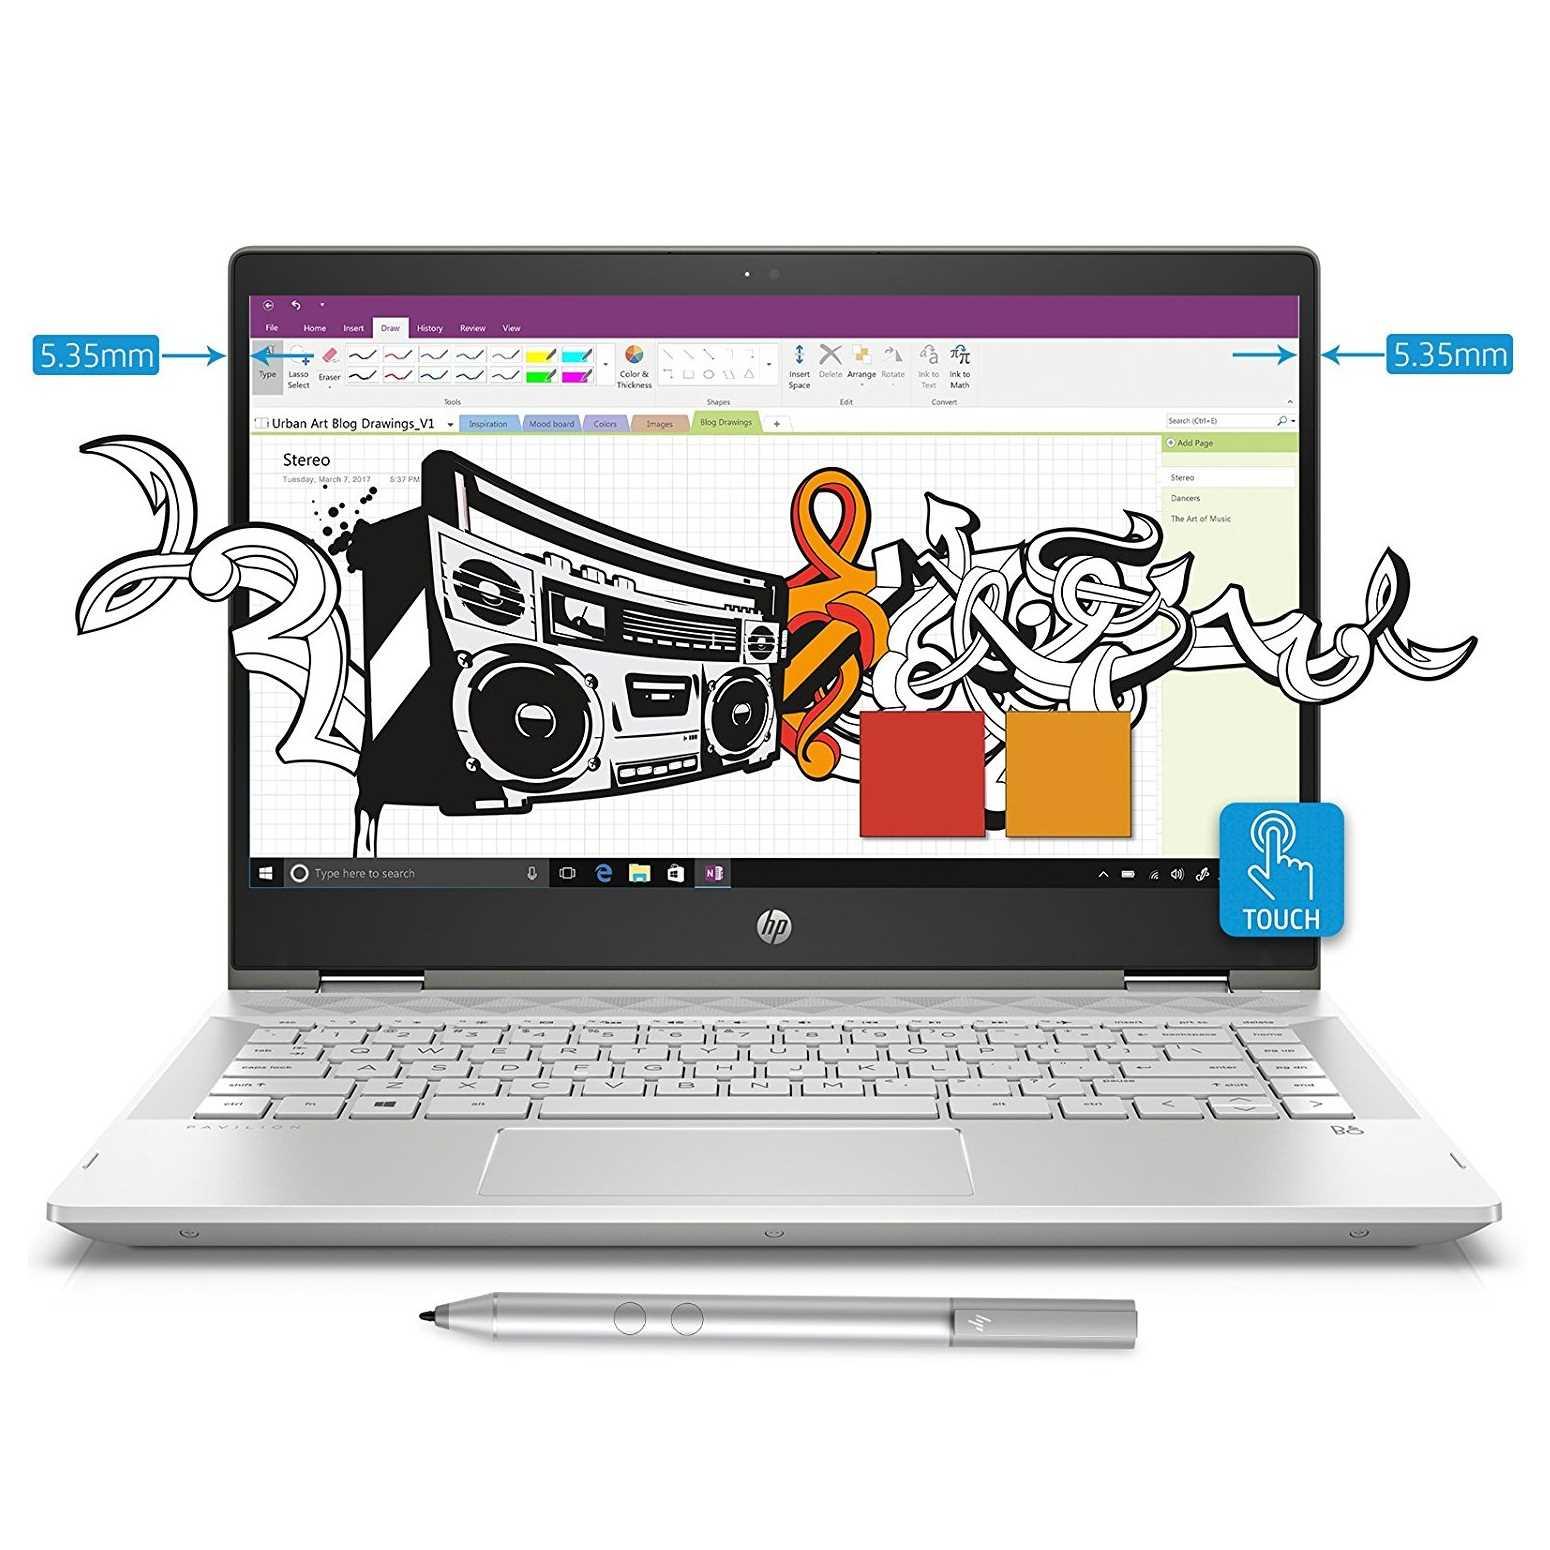 Dell Inspiron 5559 (Y566513HIN9) Notebook (Core i7-16GB-2TB